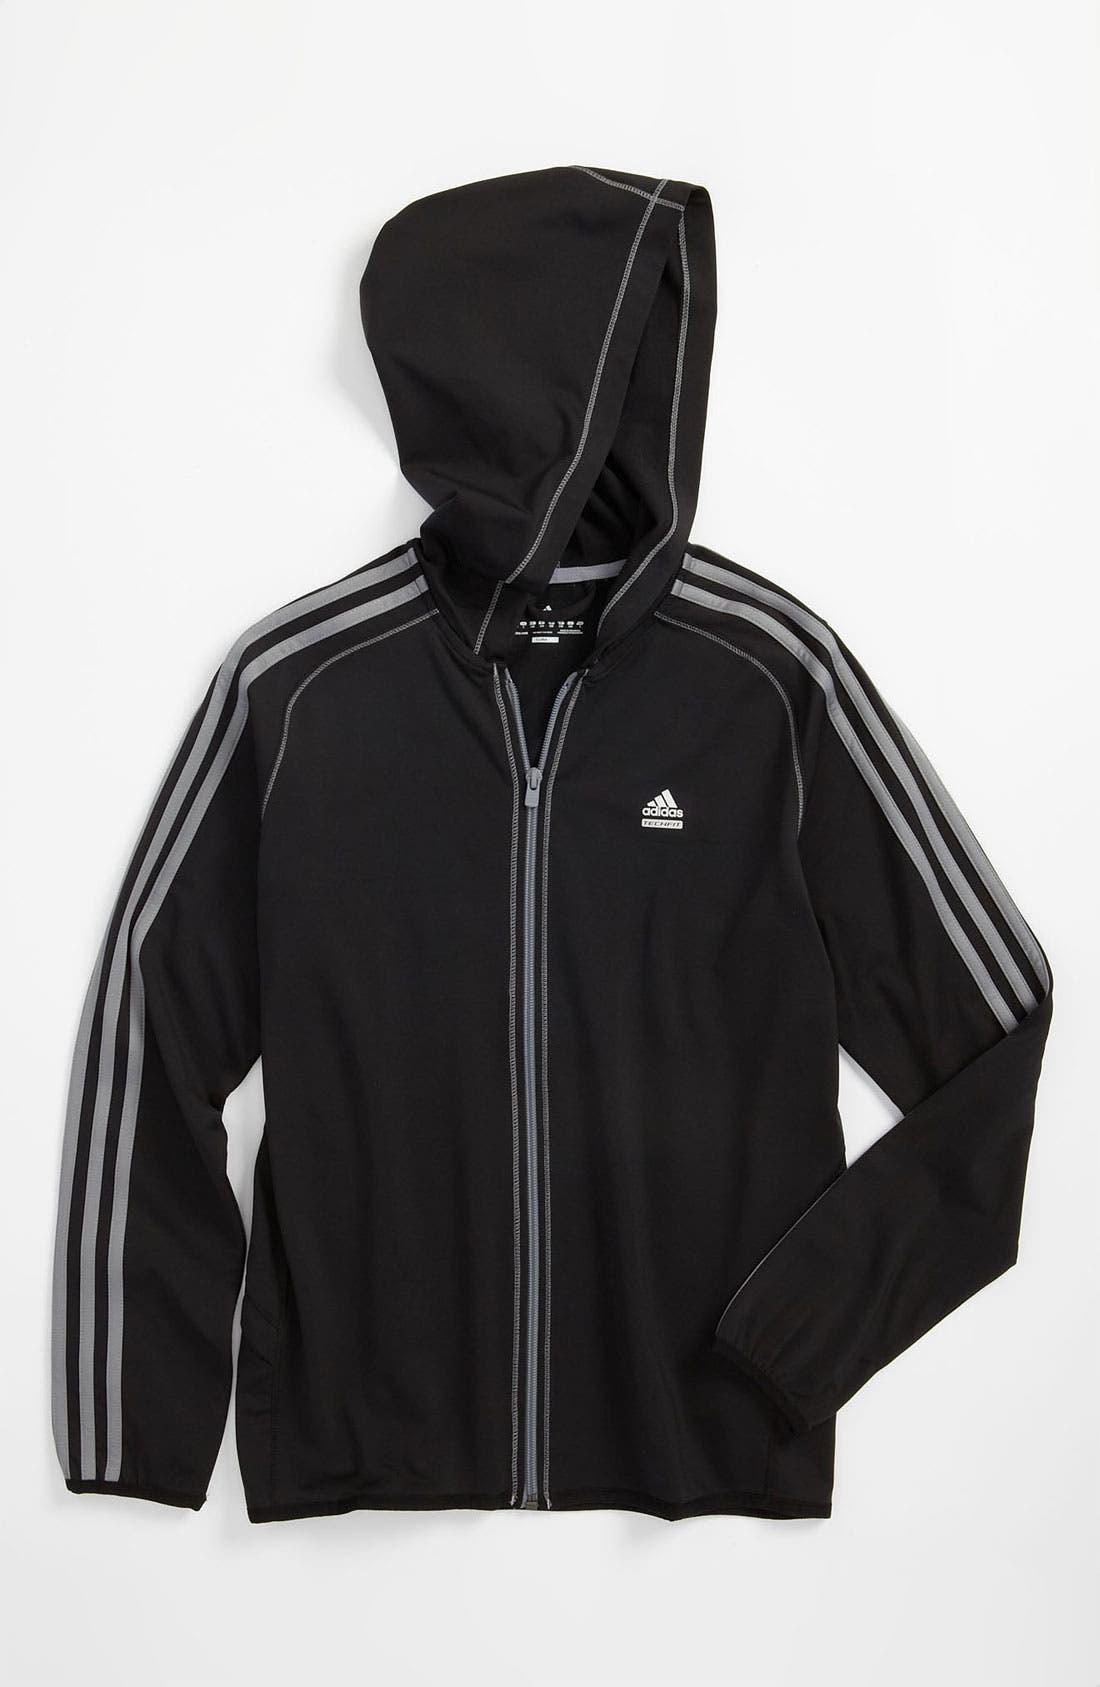 Alternate Image 1 Selected - adidas 'Tech Fit' Hoodie (Big Boys)